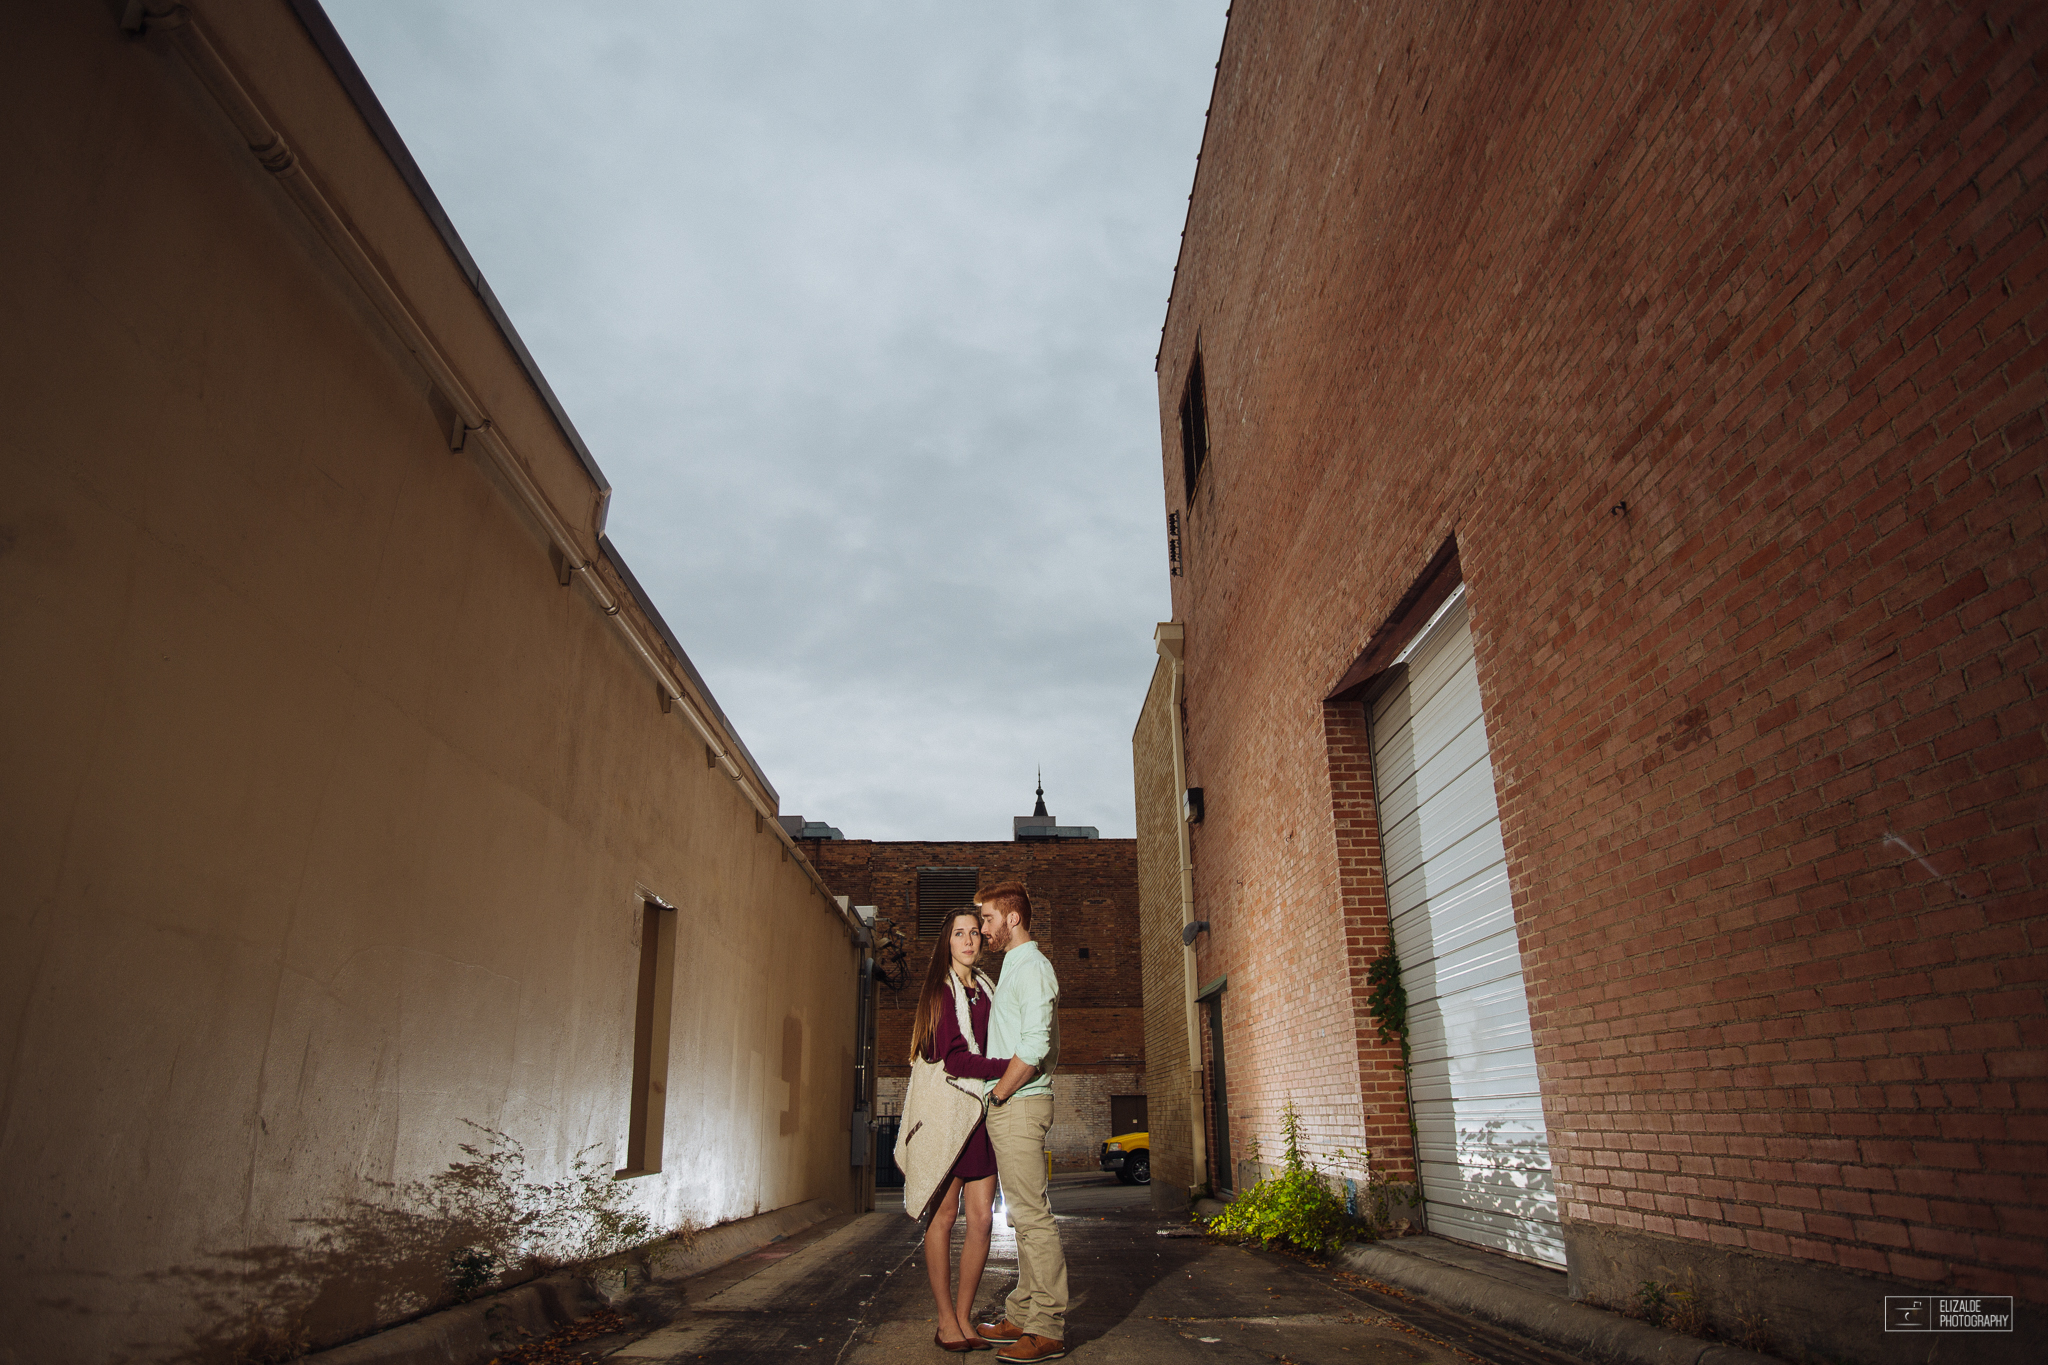 Engagement session_Engagement_Dallas photographer_Denton Photographer_elizalde photography_DFW wedding photographer_wedding (7 of 24).jpg